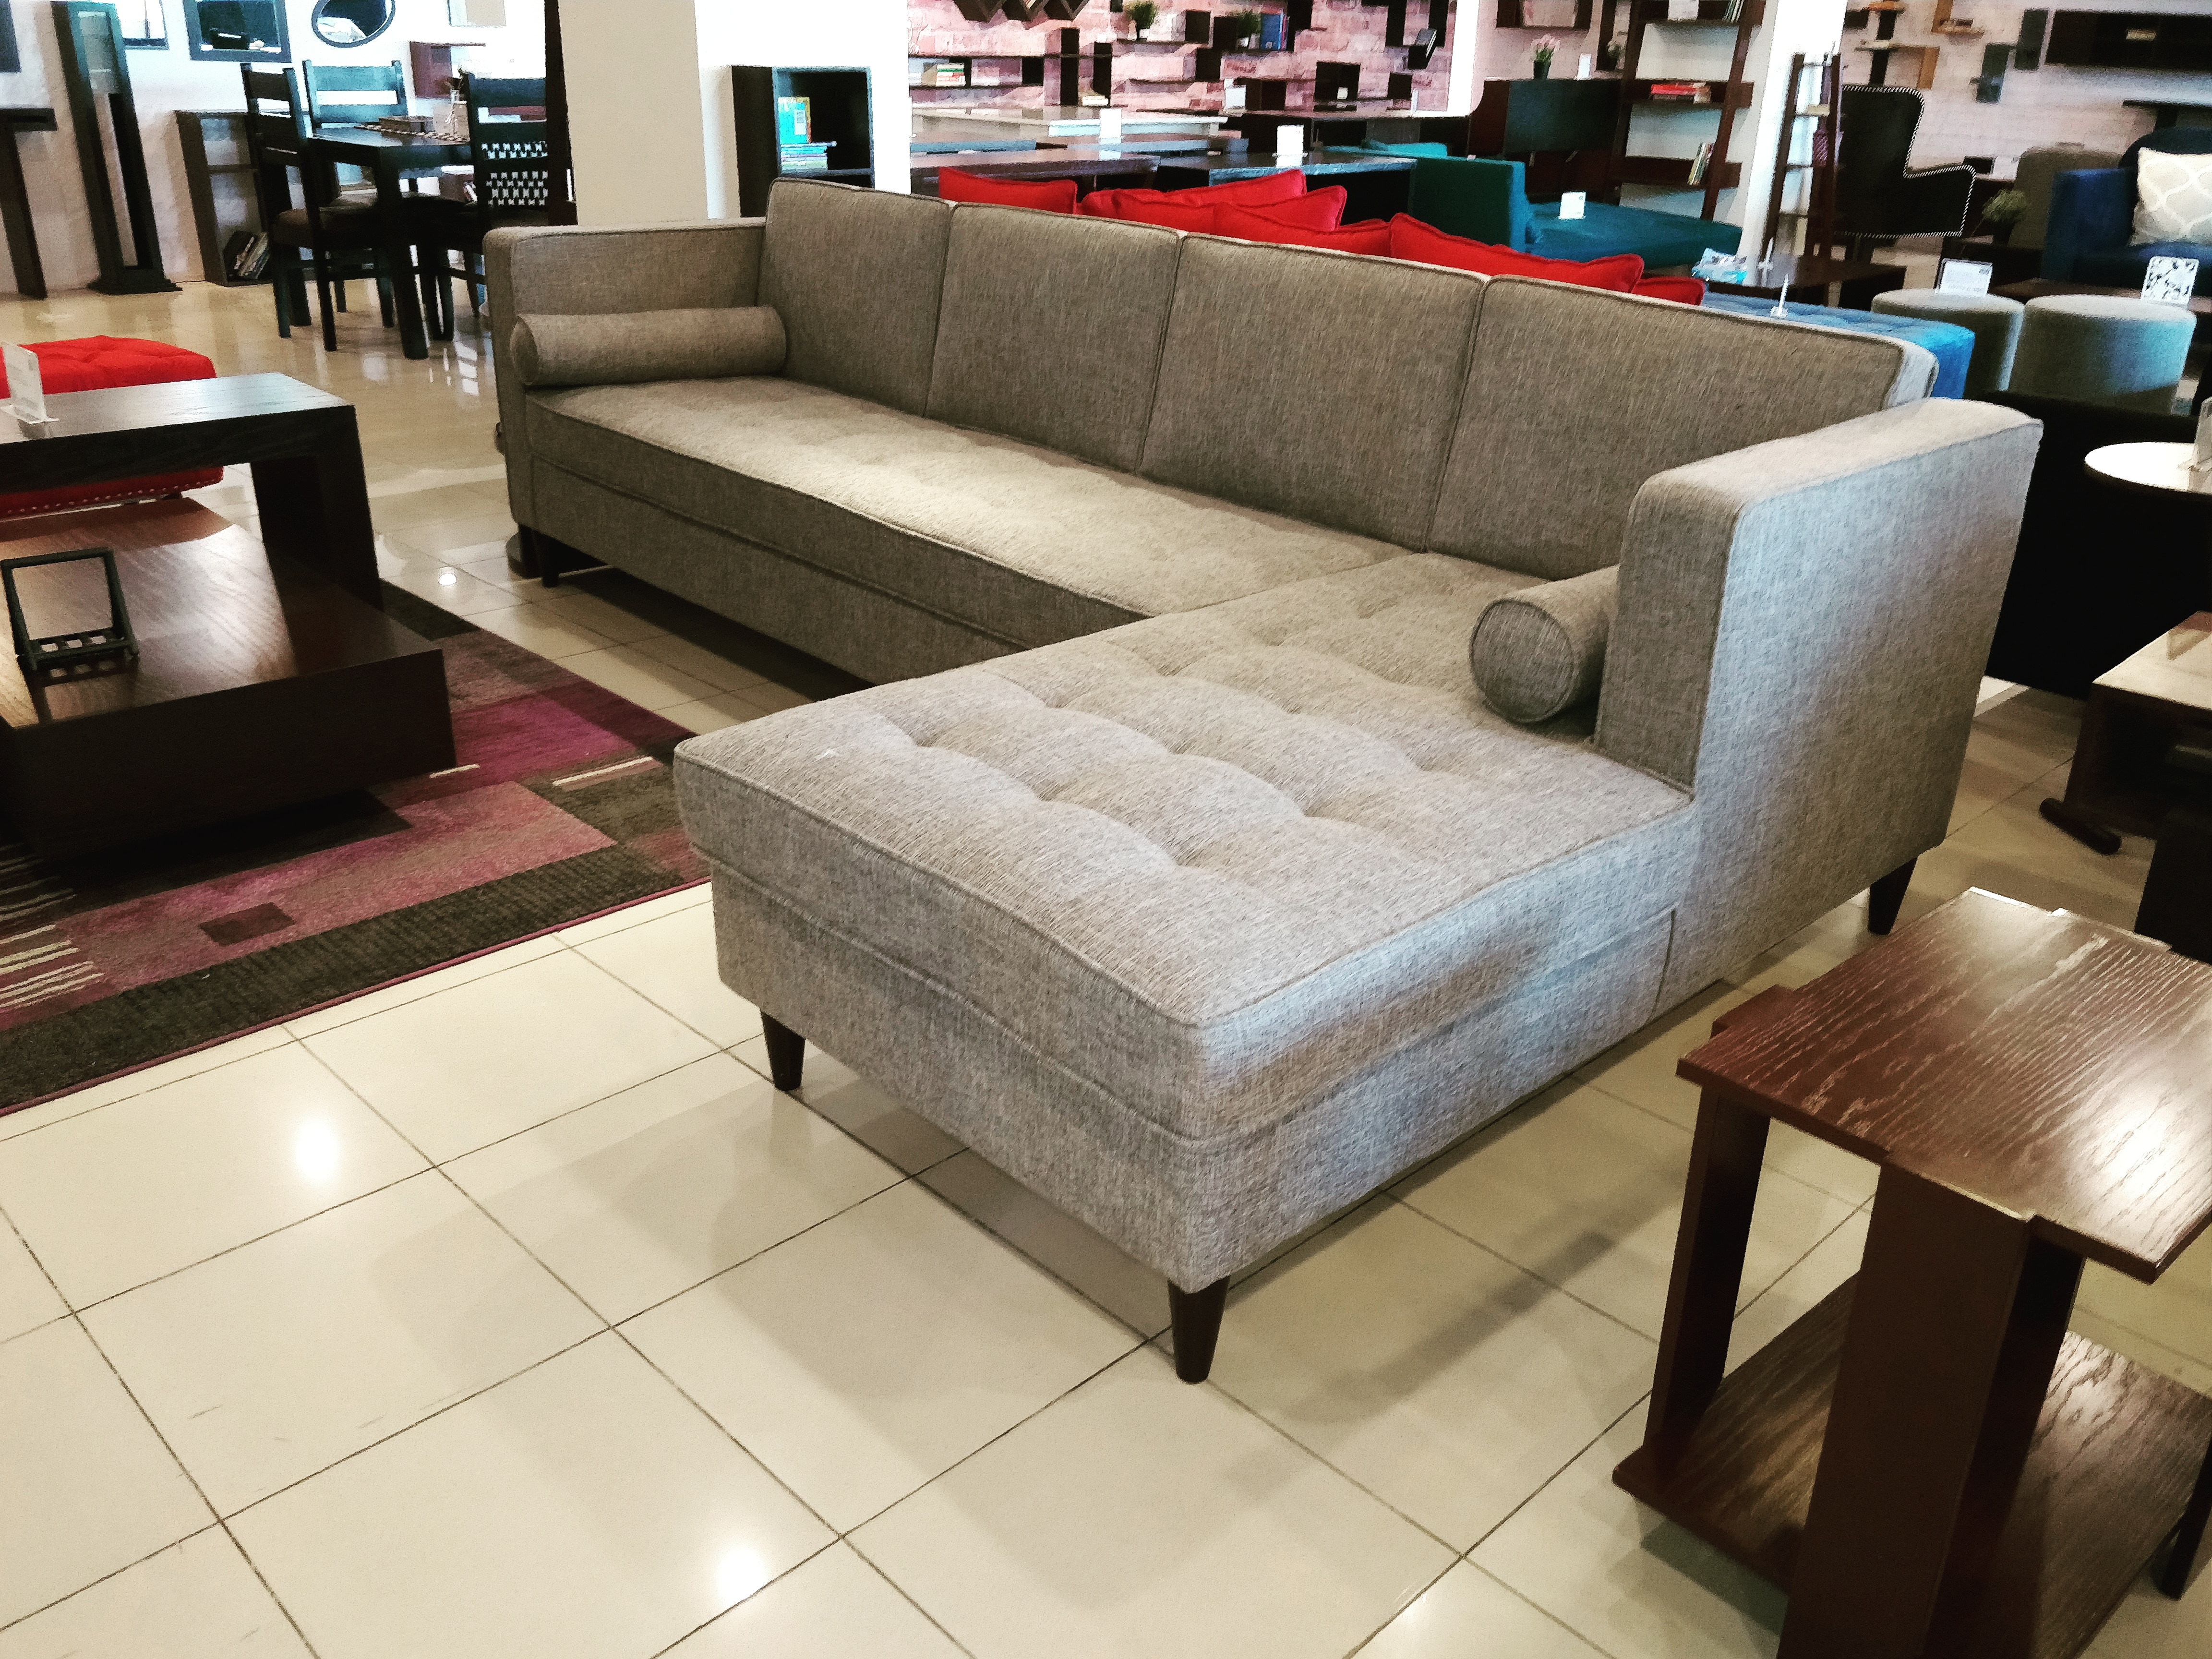 Negrita 6 Seater L Shaped Sofa